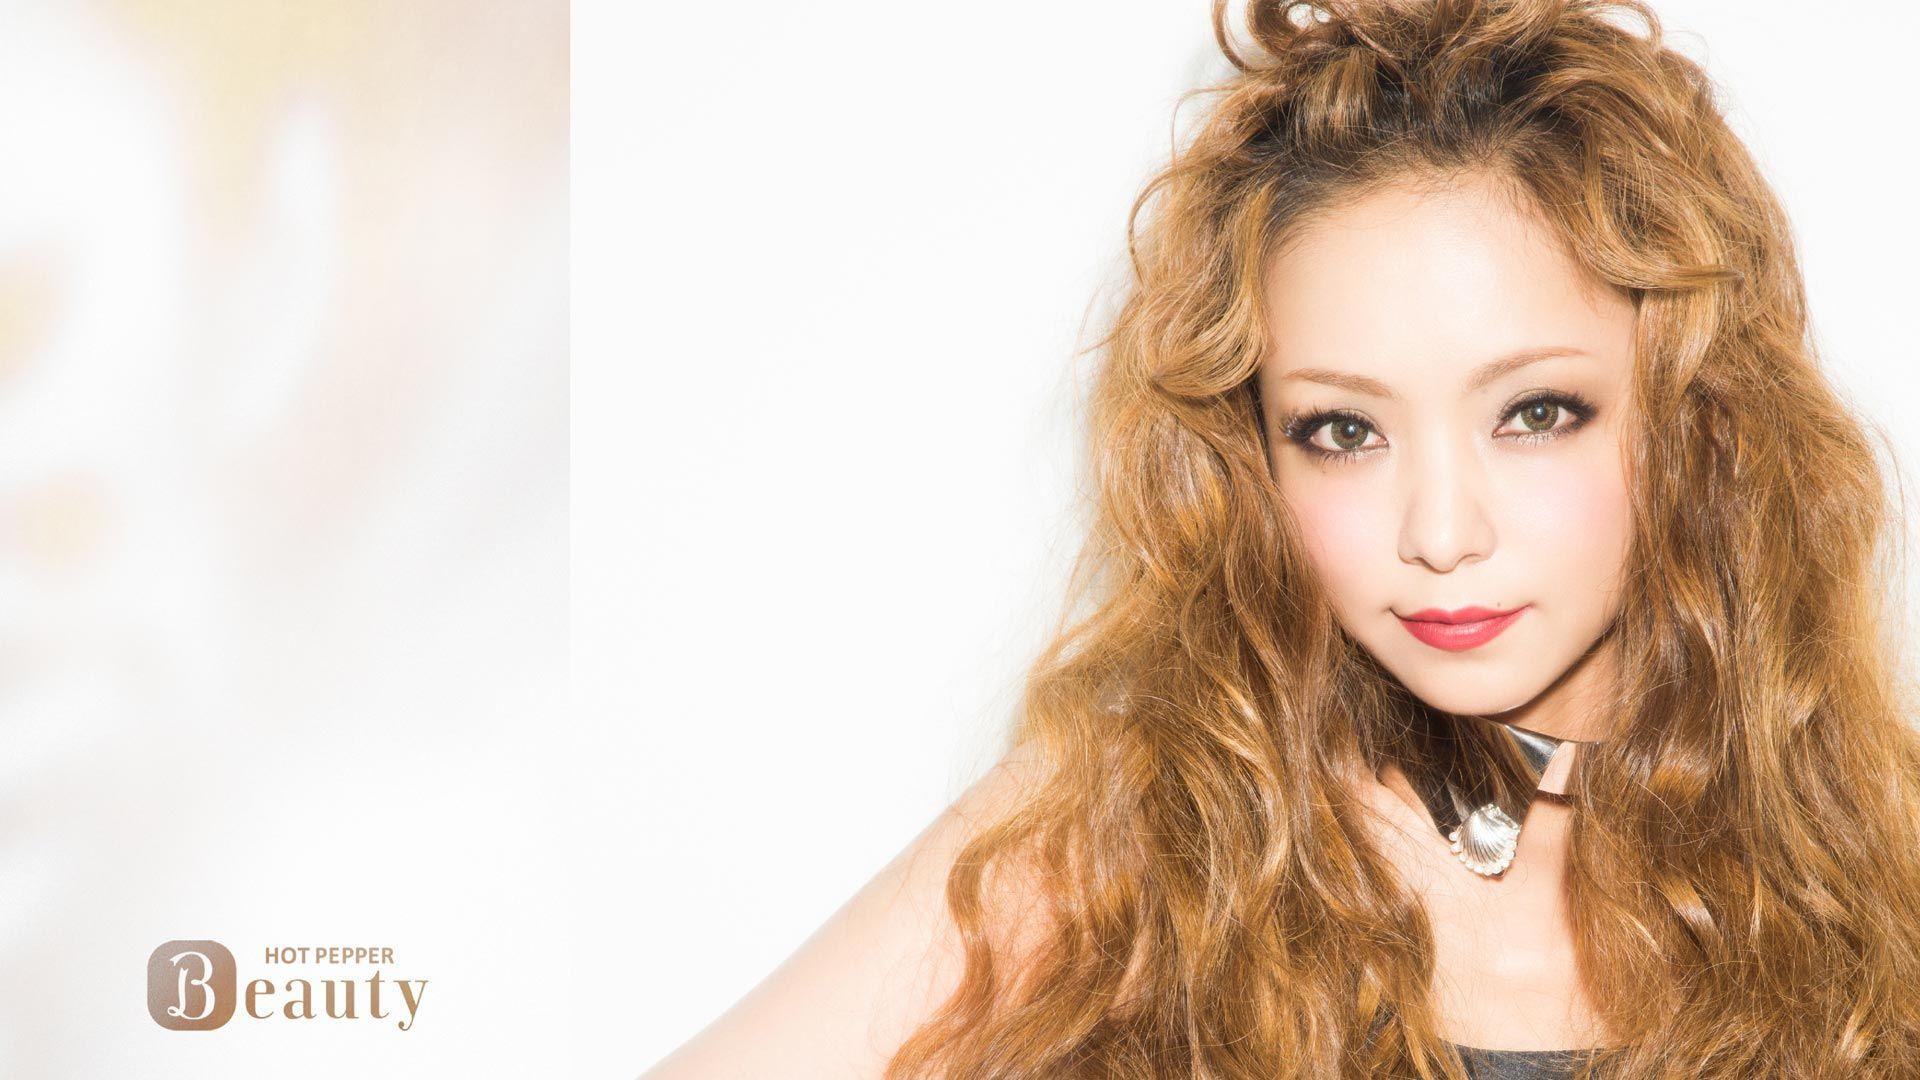 Hot Pepper Beauty X 安室奈美恵 Feel Tour 2013 1920 X 1080